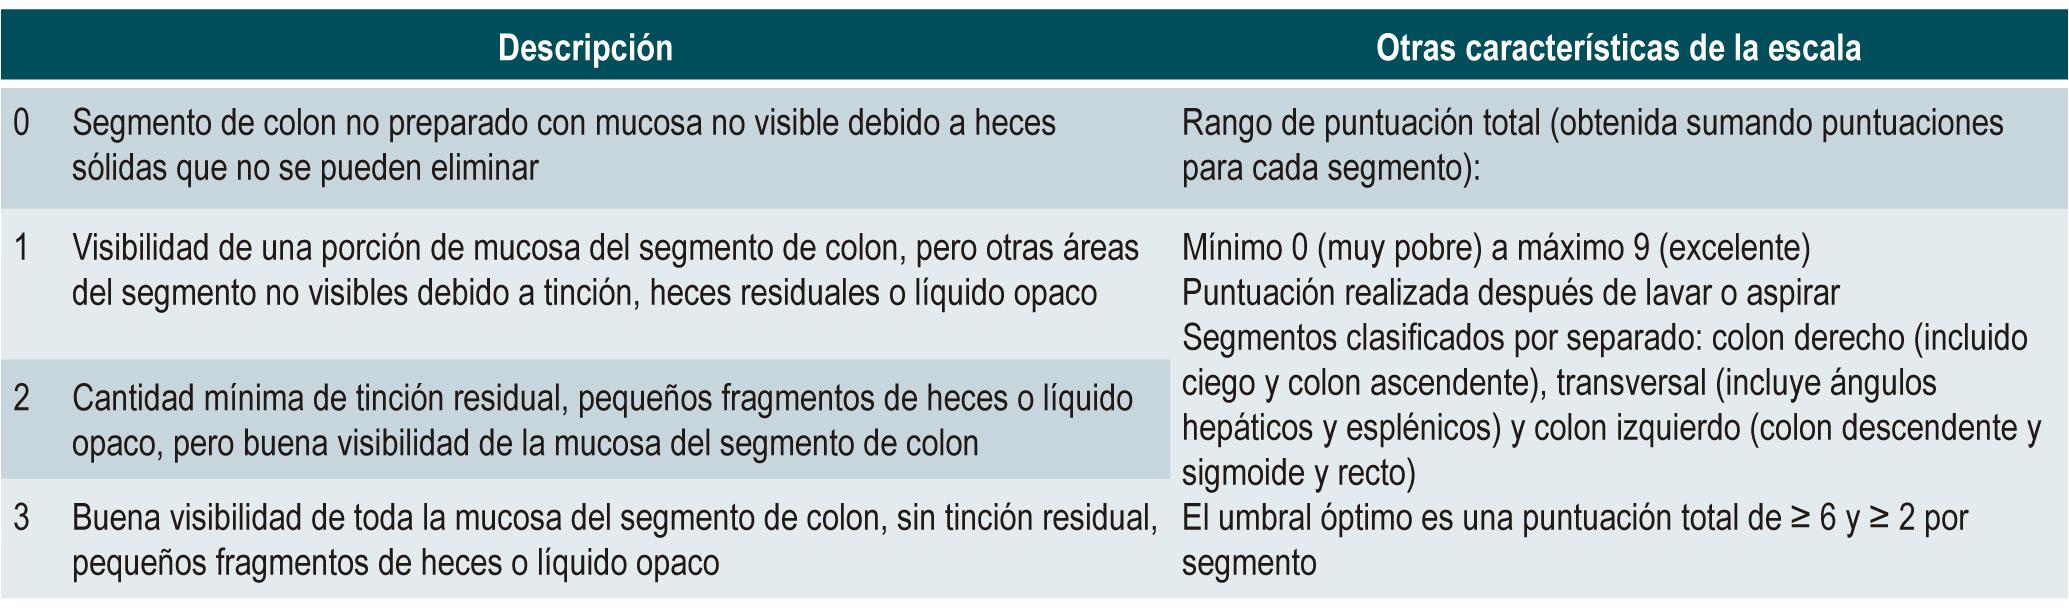 Tabla 1. Escala de preparación intestinal de Boston (por segmento de colon)(3)